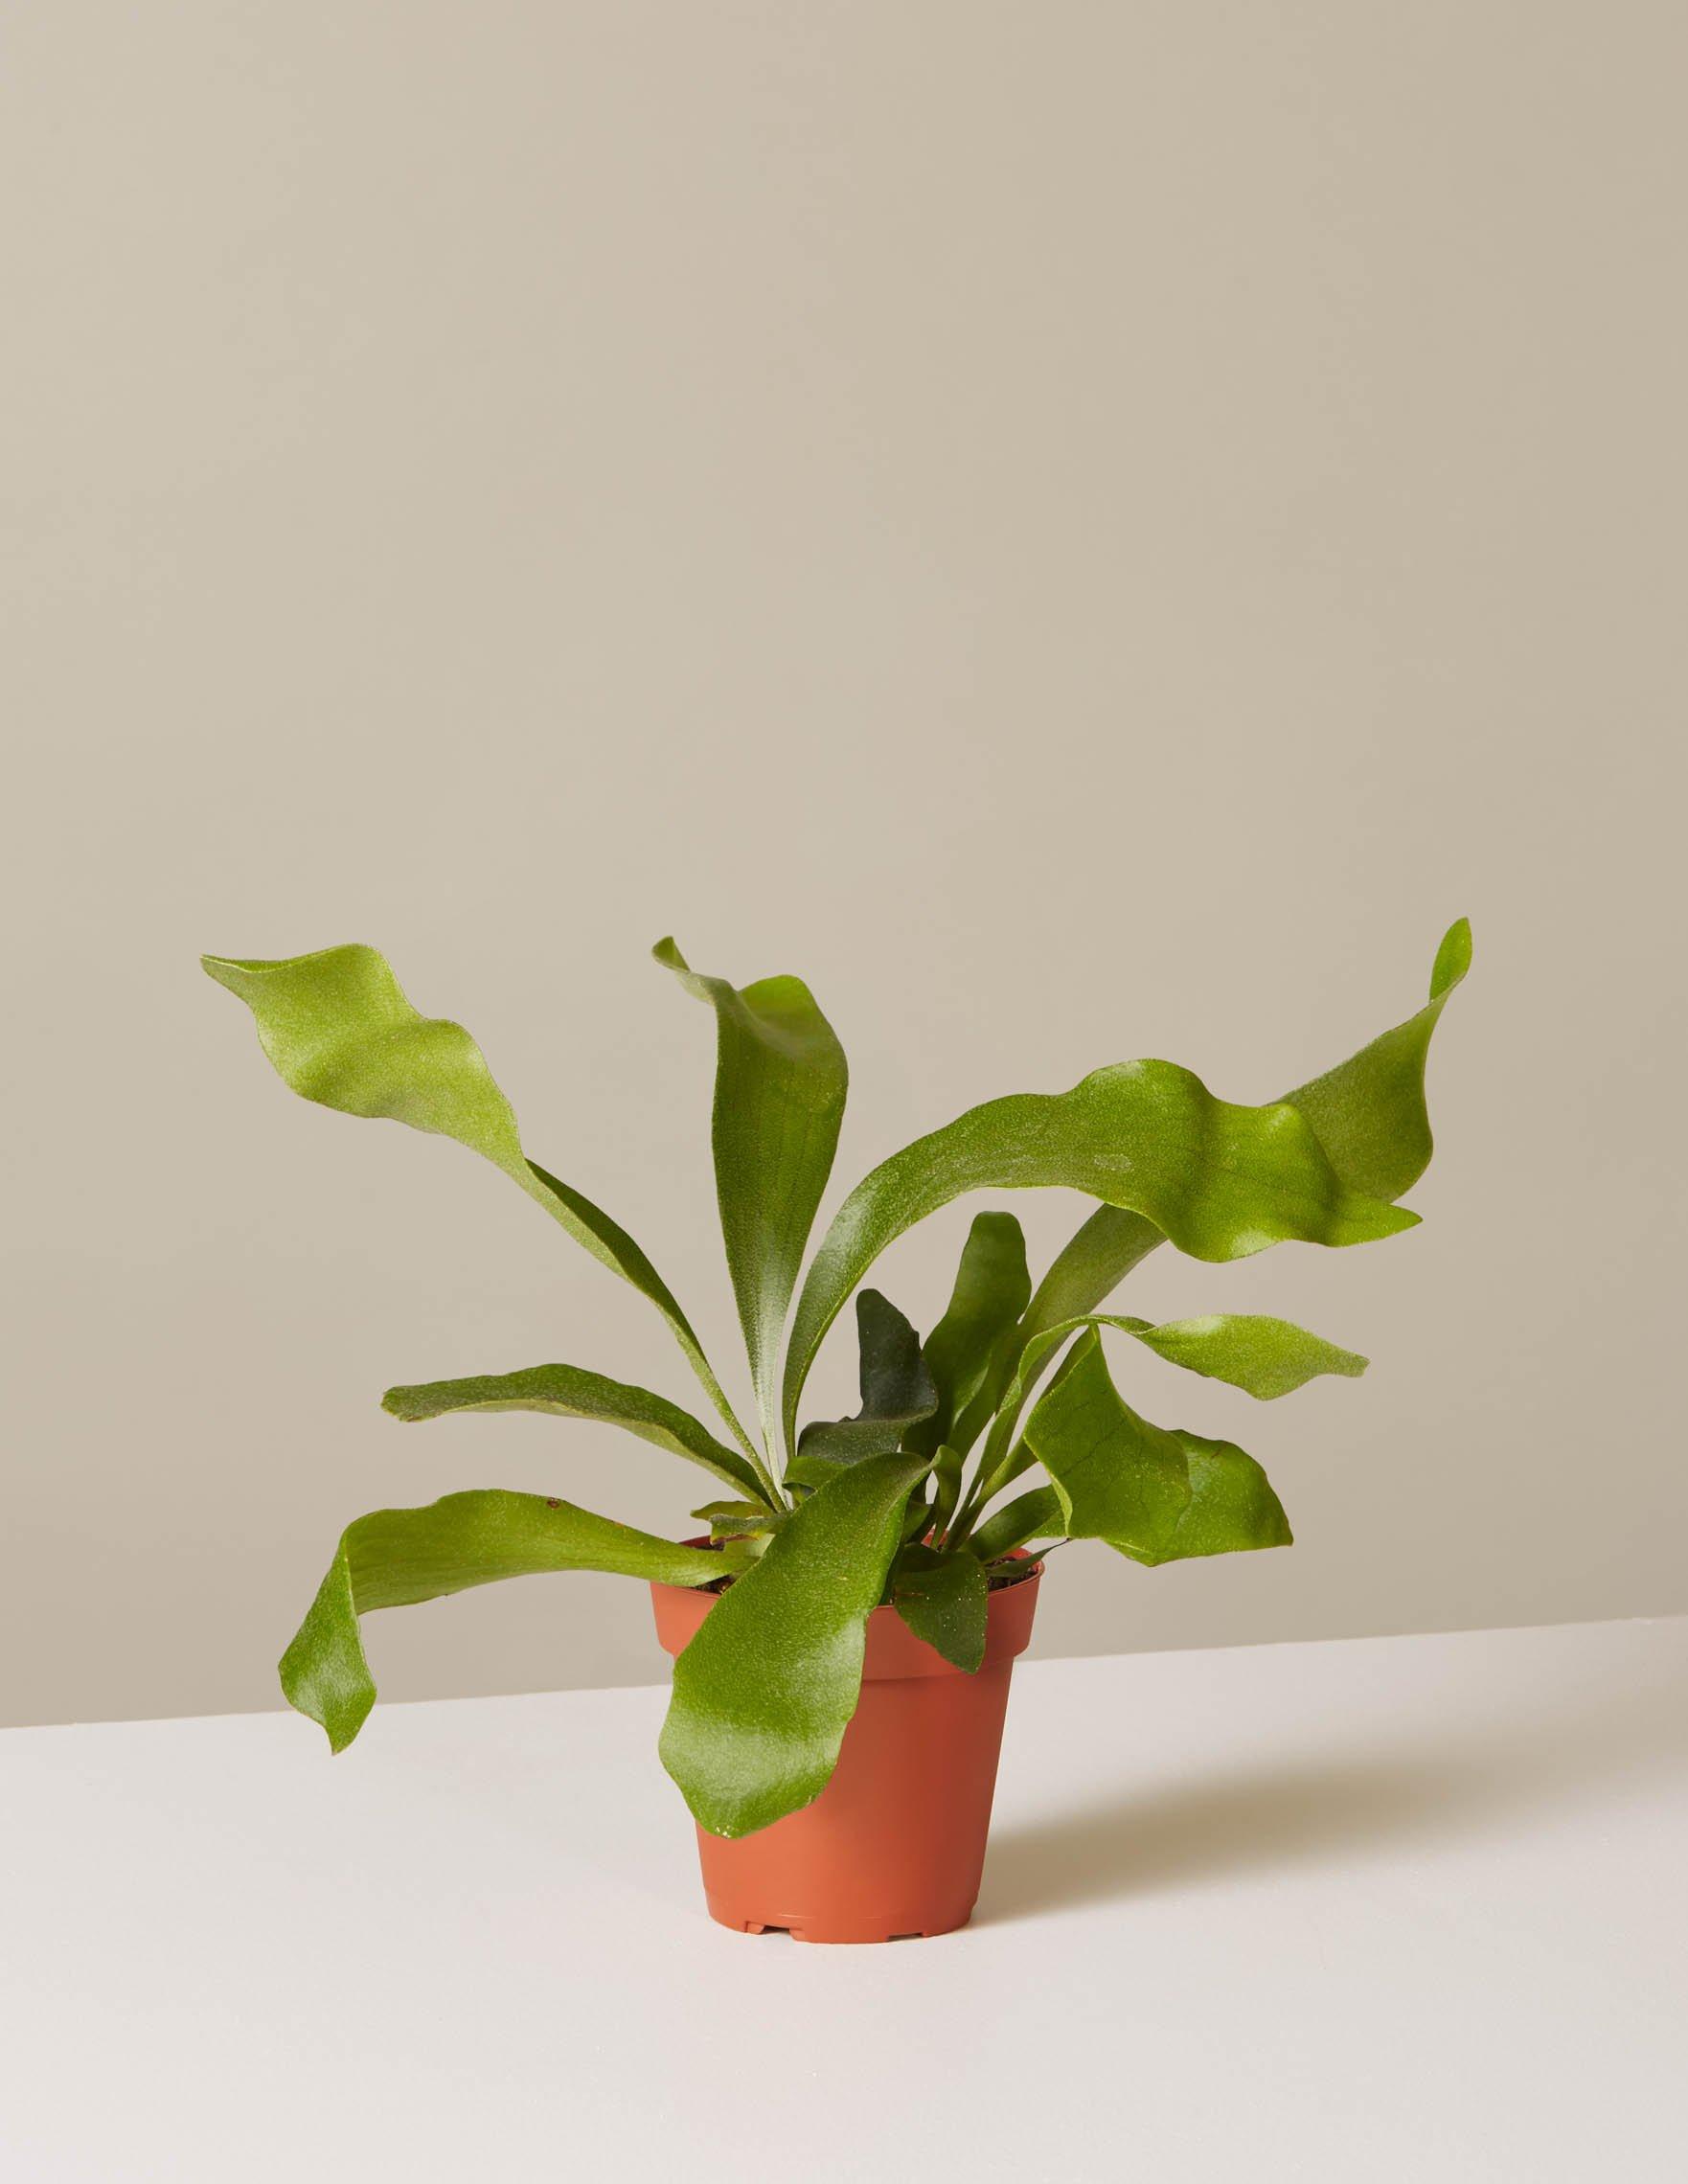 valentinesgiftyourselfplant.jpg